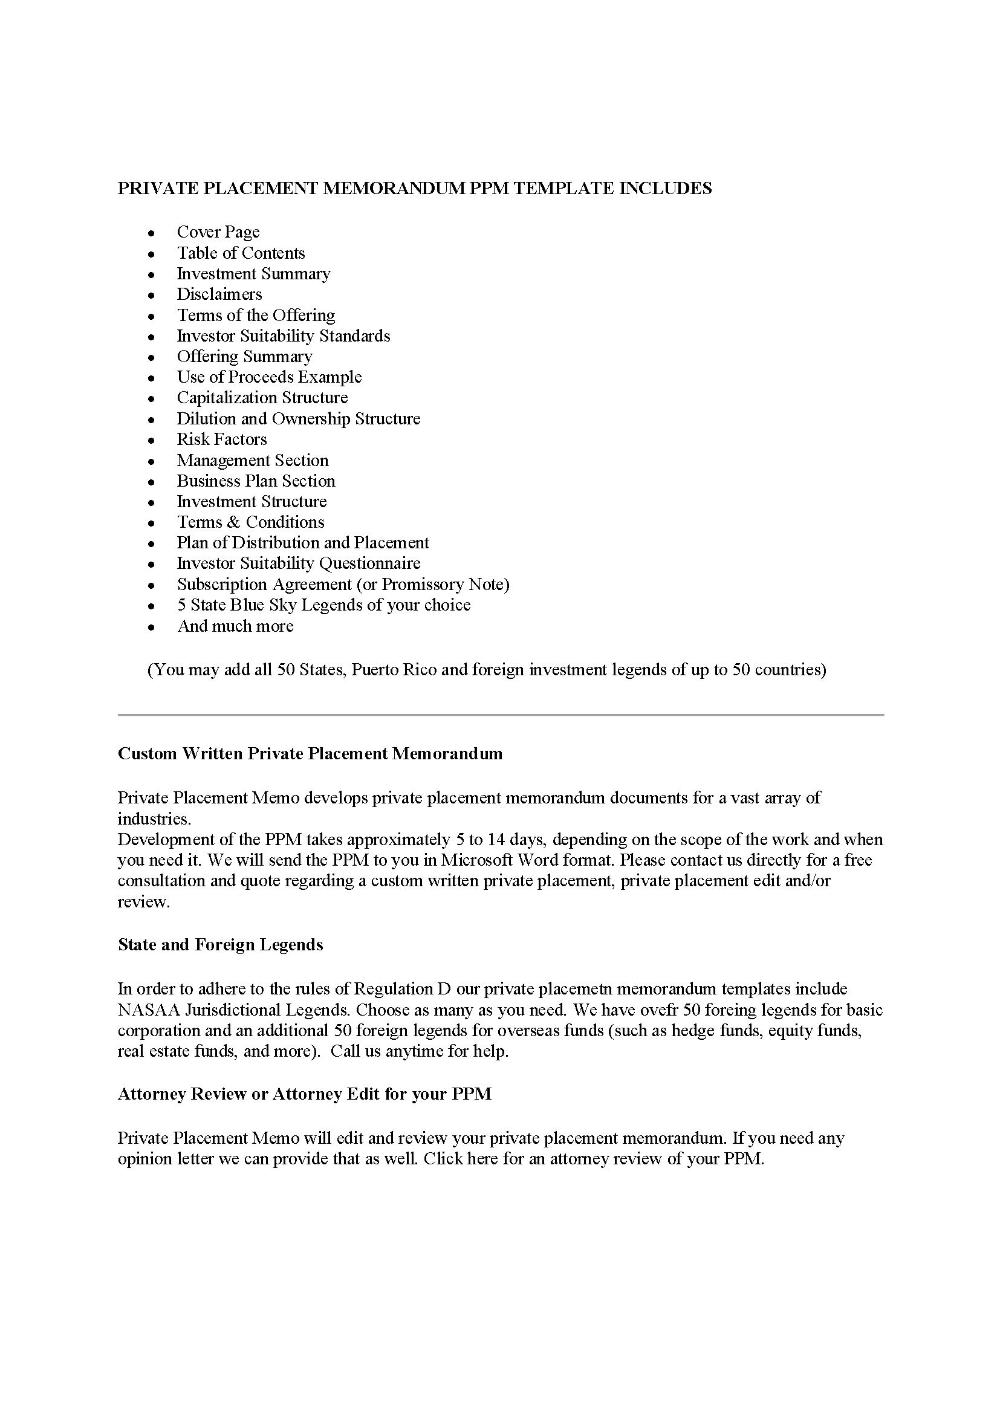 Finders Fee Agreementprivate Placement Memorandum in Real ...